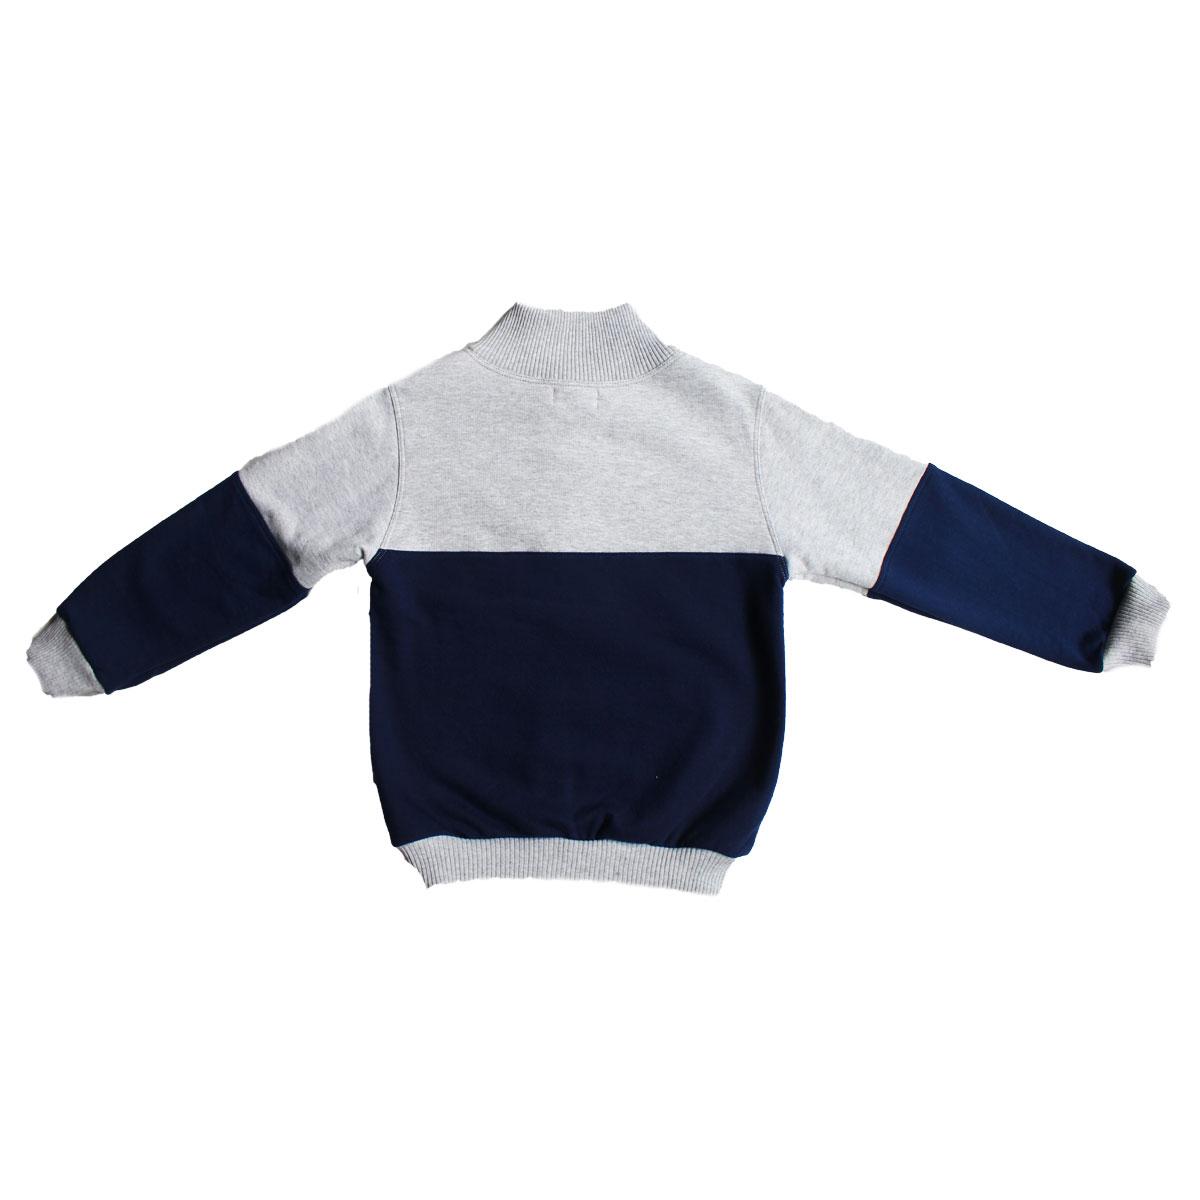 Cross Neck PullOver_Gray&Blue Back